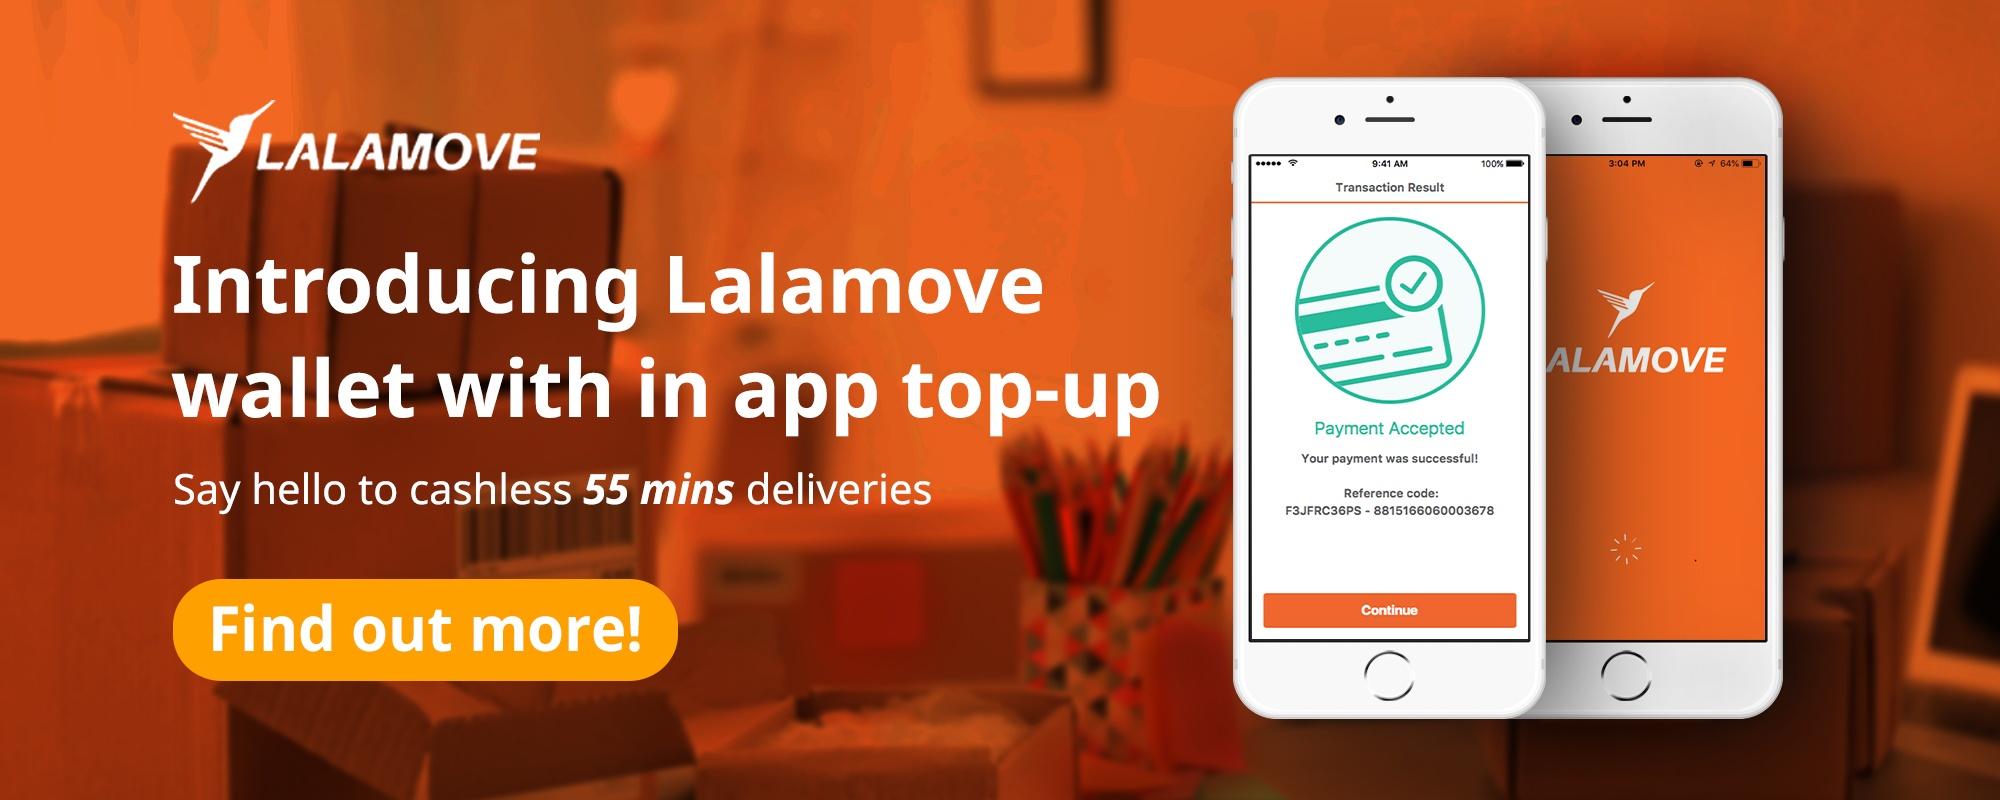 Lalamove - Lalamove Wallet & In App Top Up